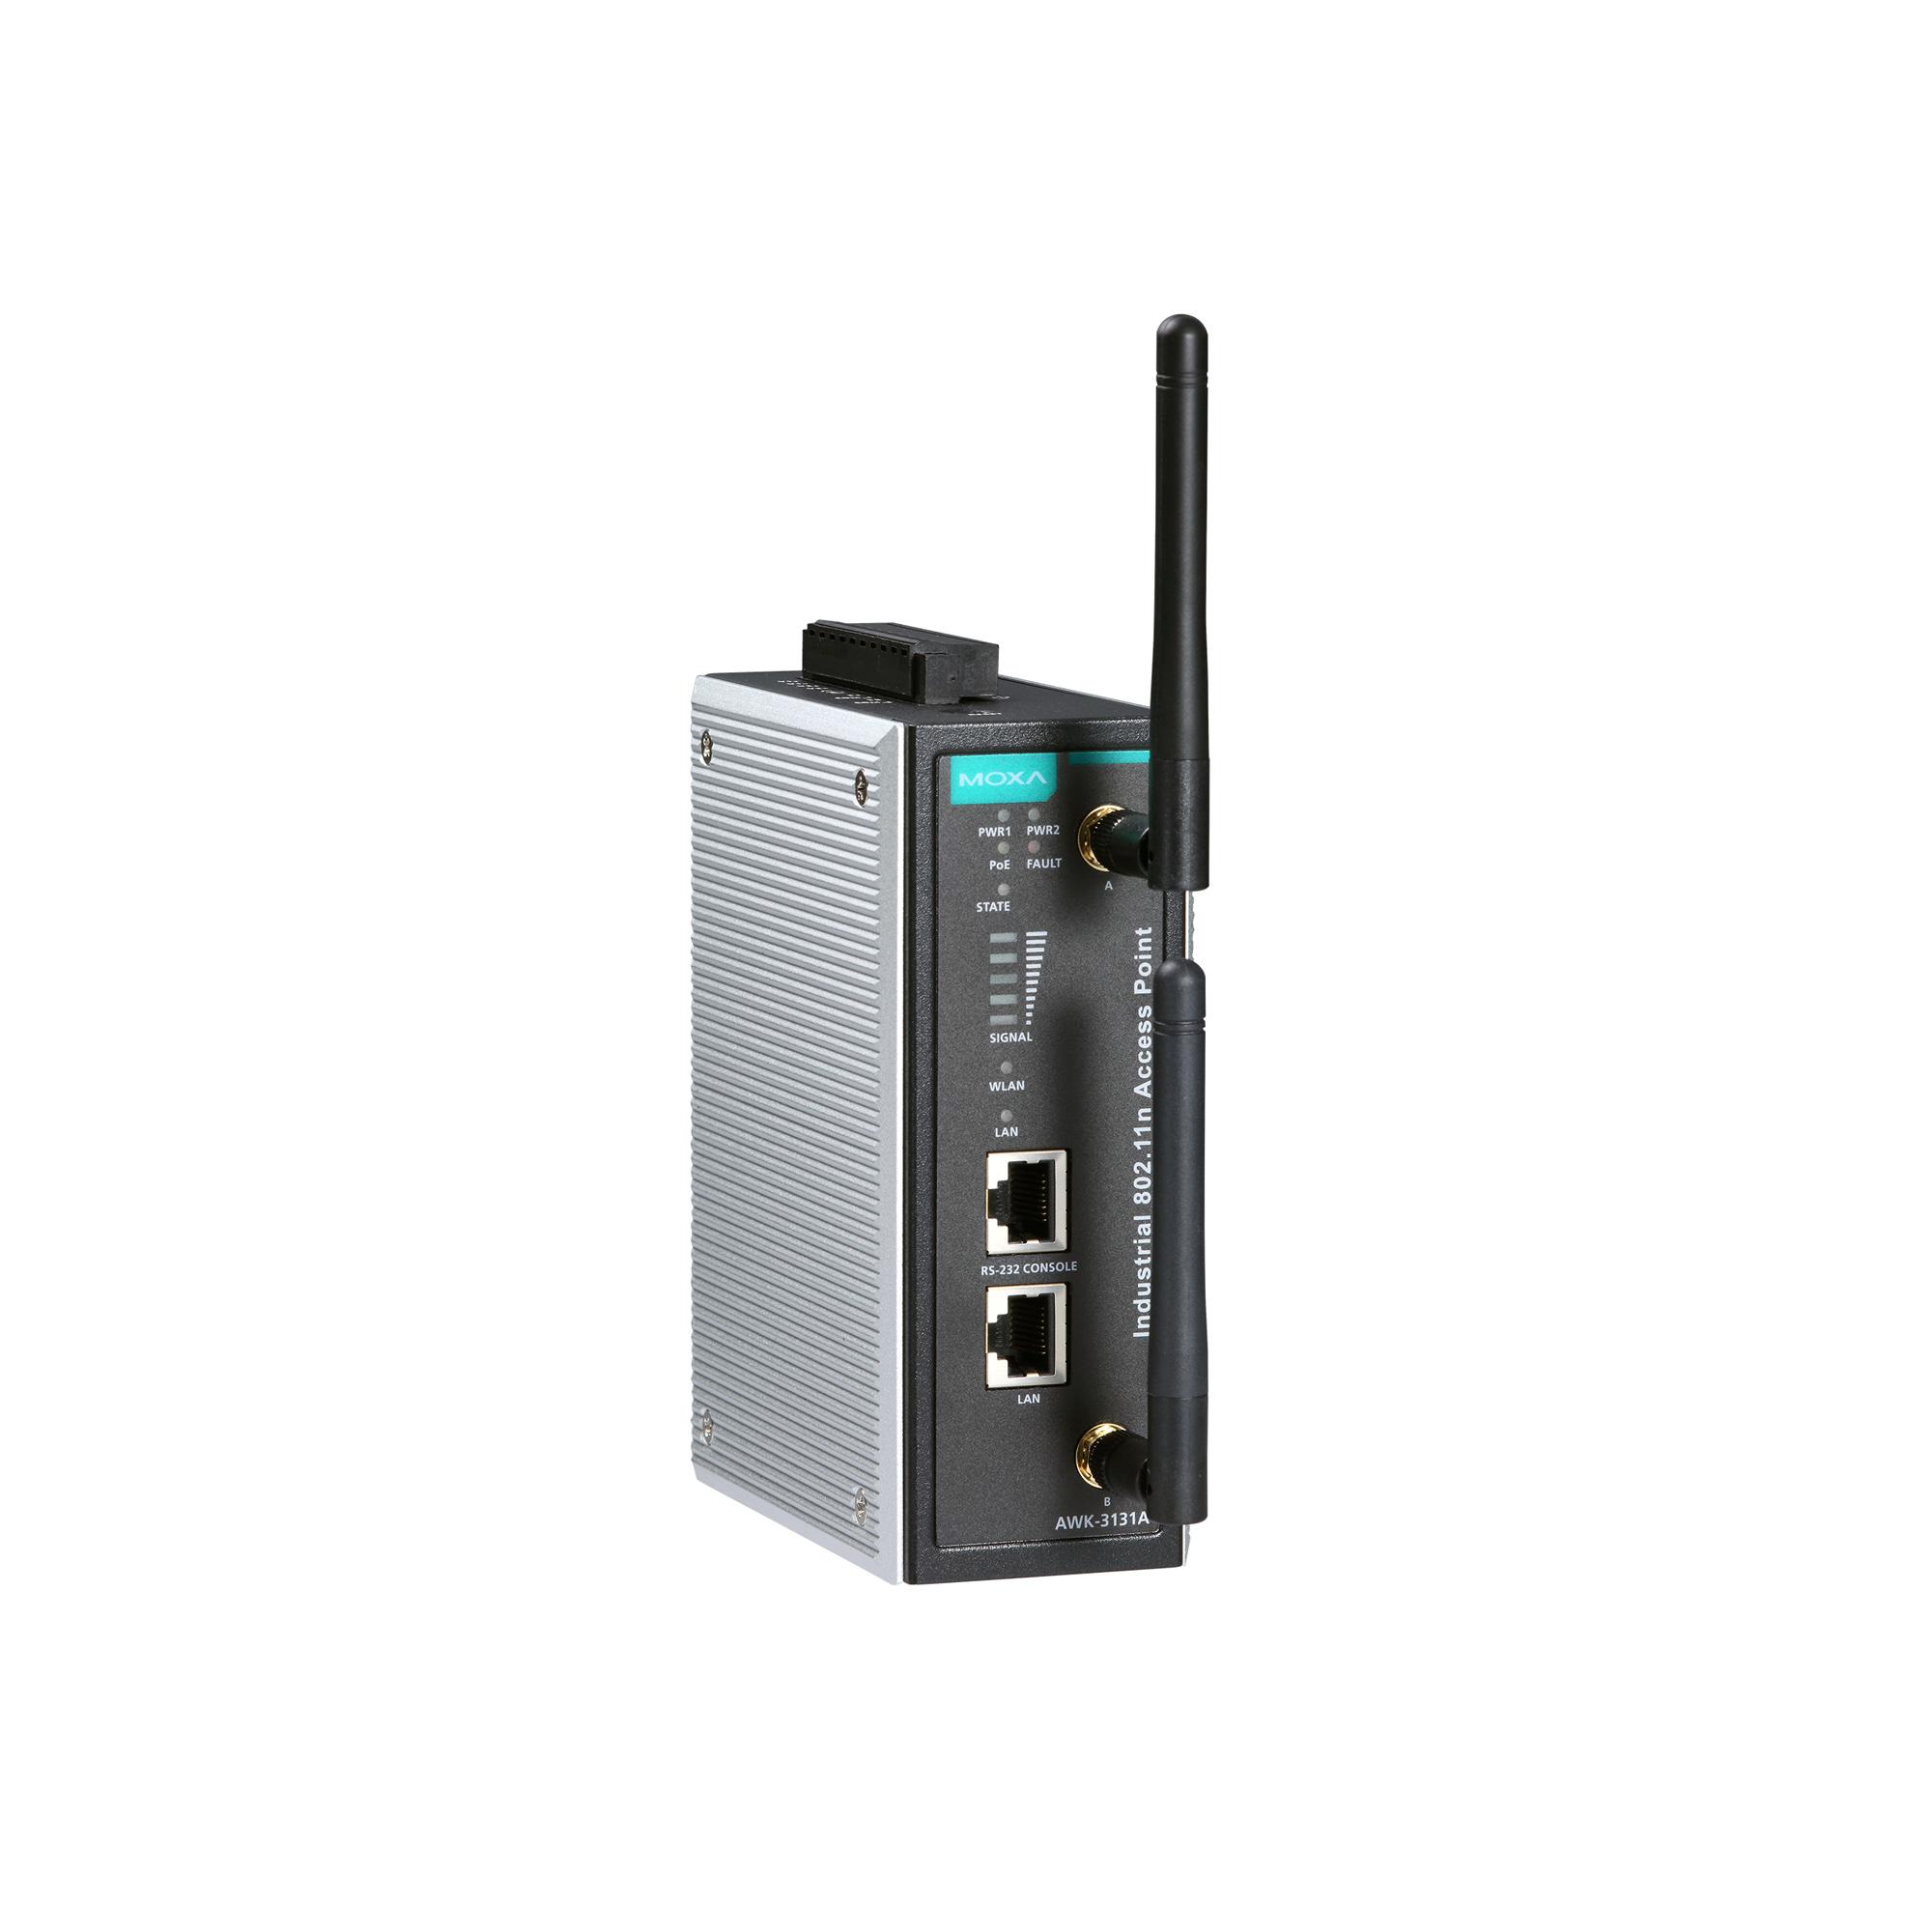 AWK-3131A Series - WLAN AP/Bridge/Client | MOXA